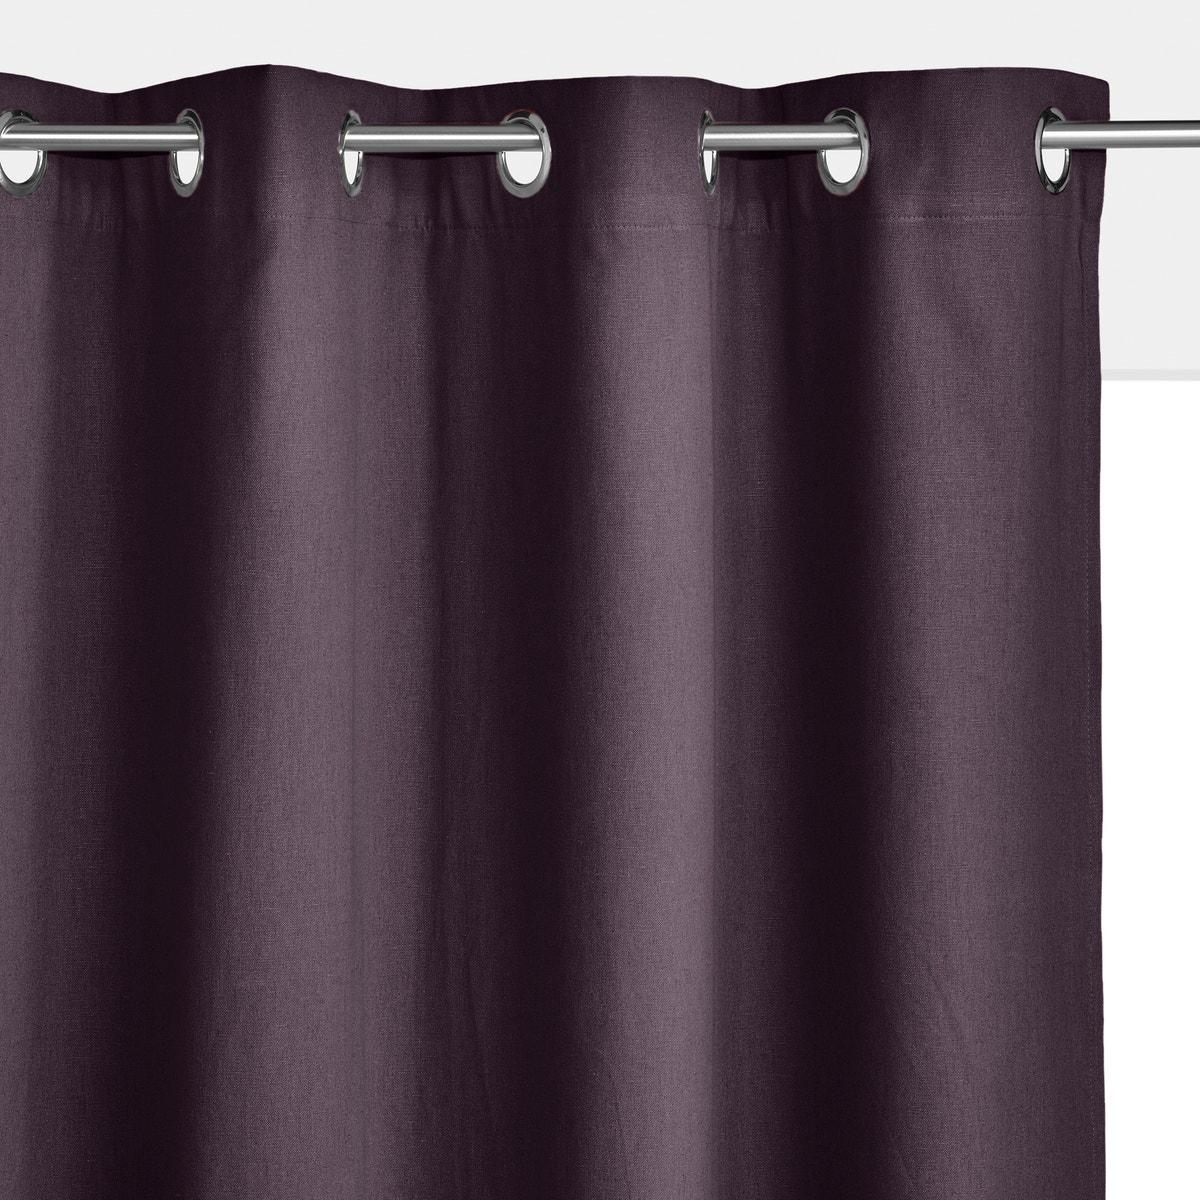 La rotoute Interieurs Taima Linen & Cotton Cotton Cotton Single Curtain 350084754 fda5f3